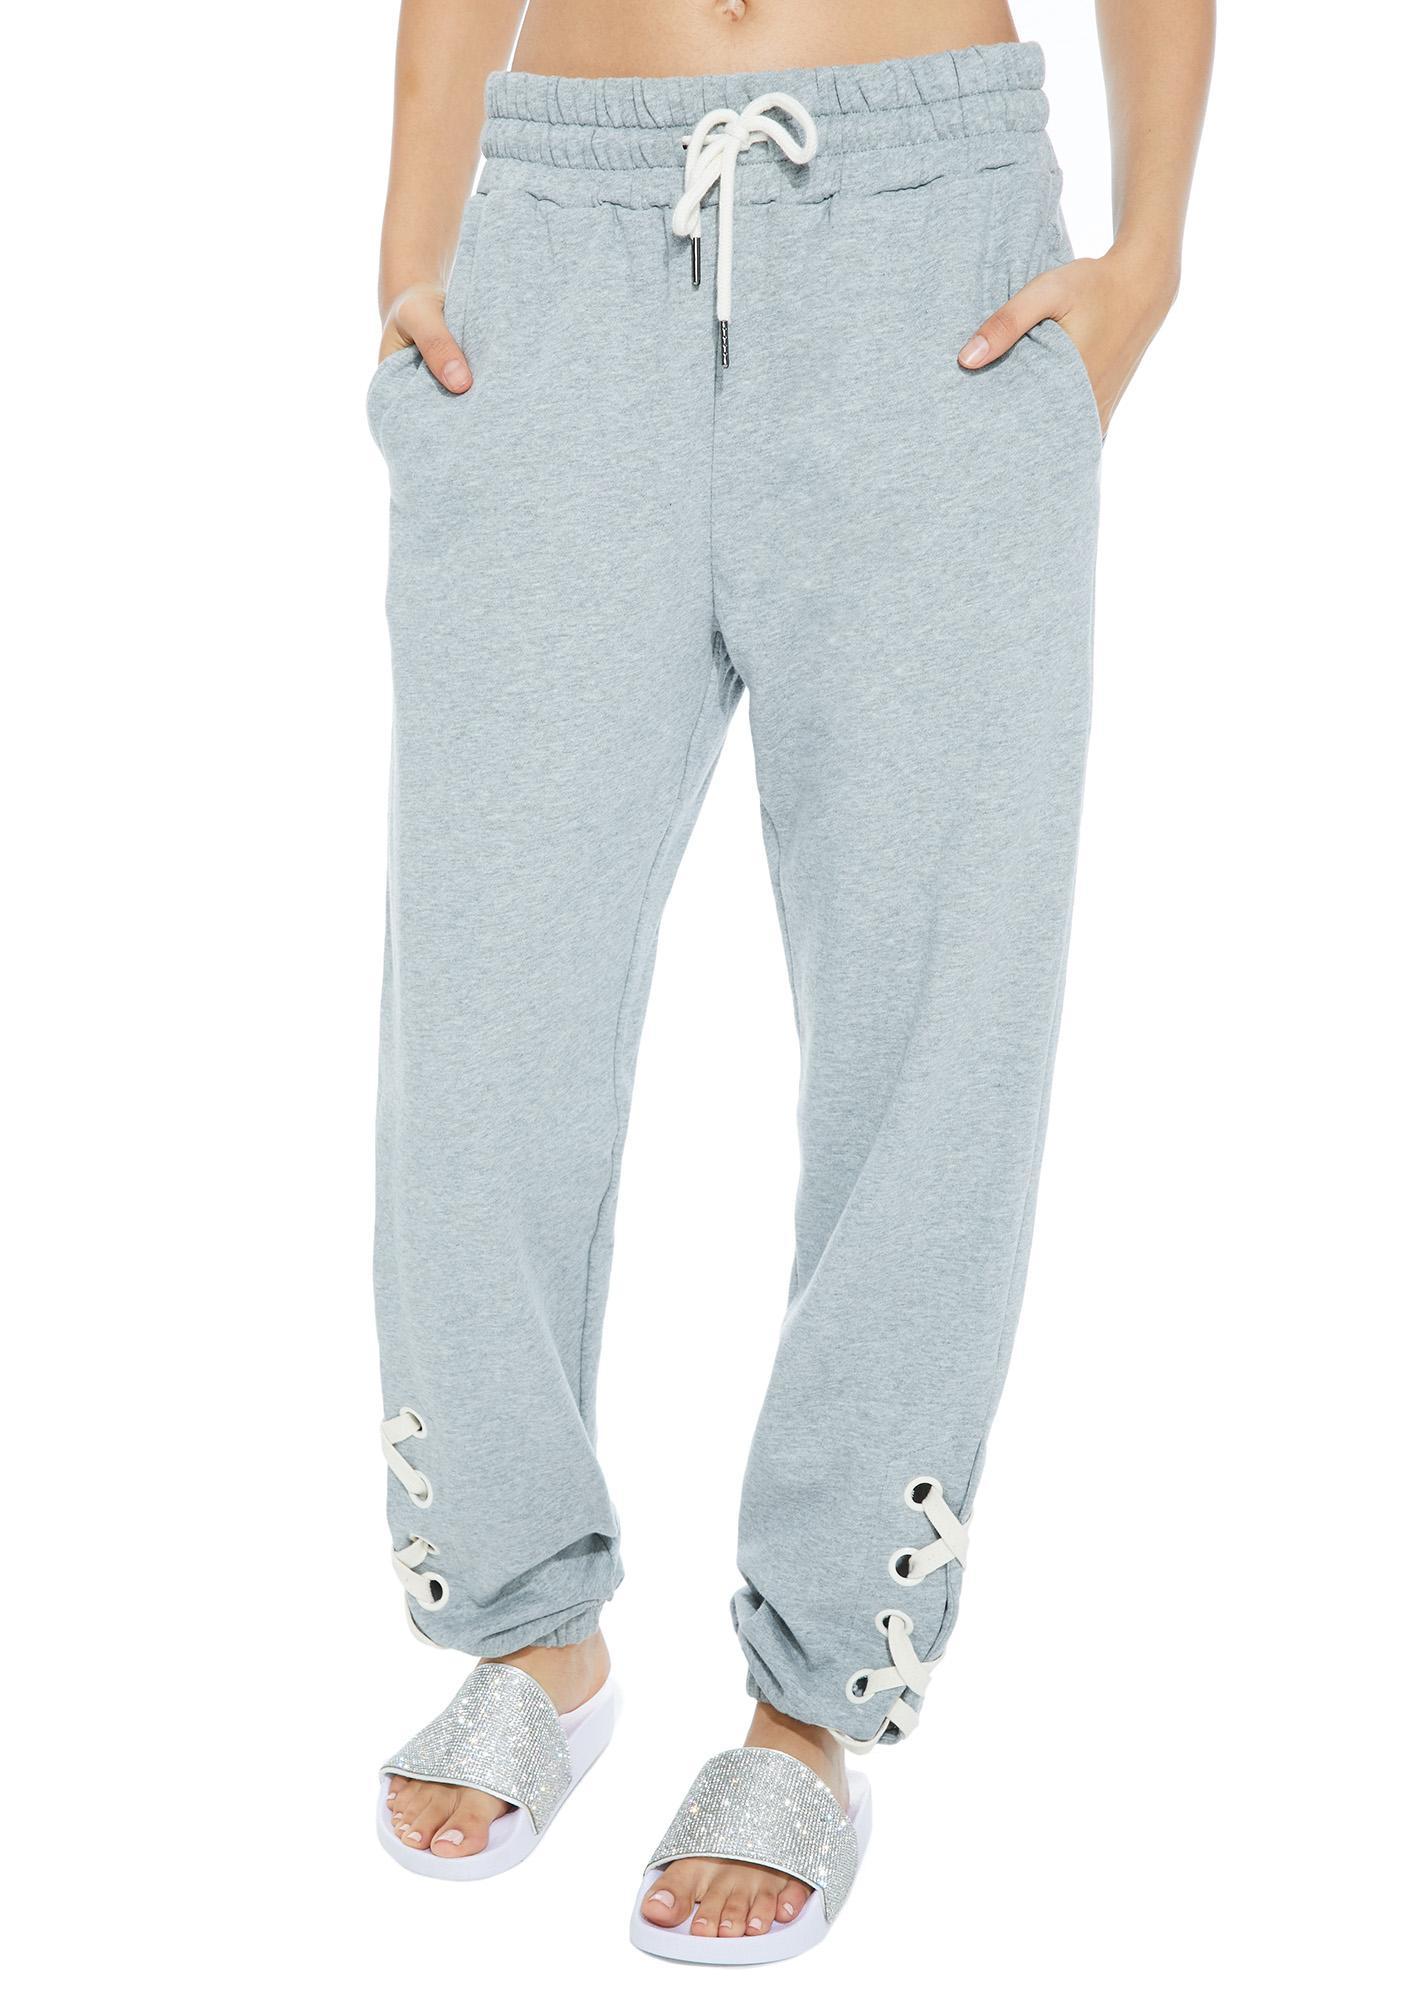 Crash Damage Lace-Up Sweatpants